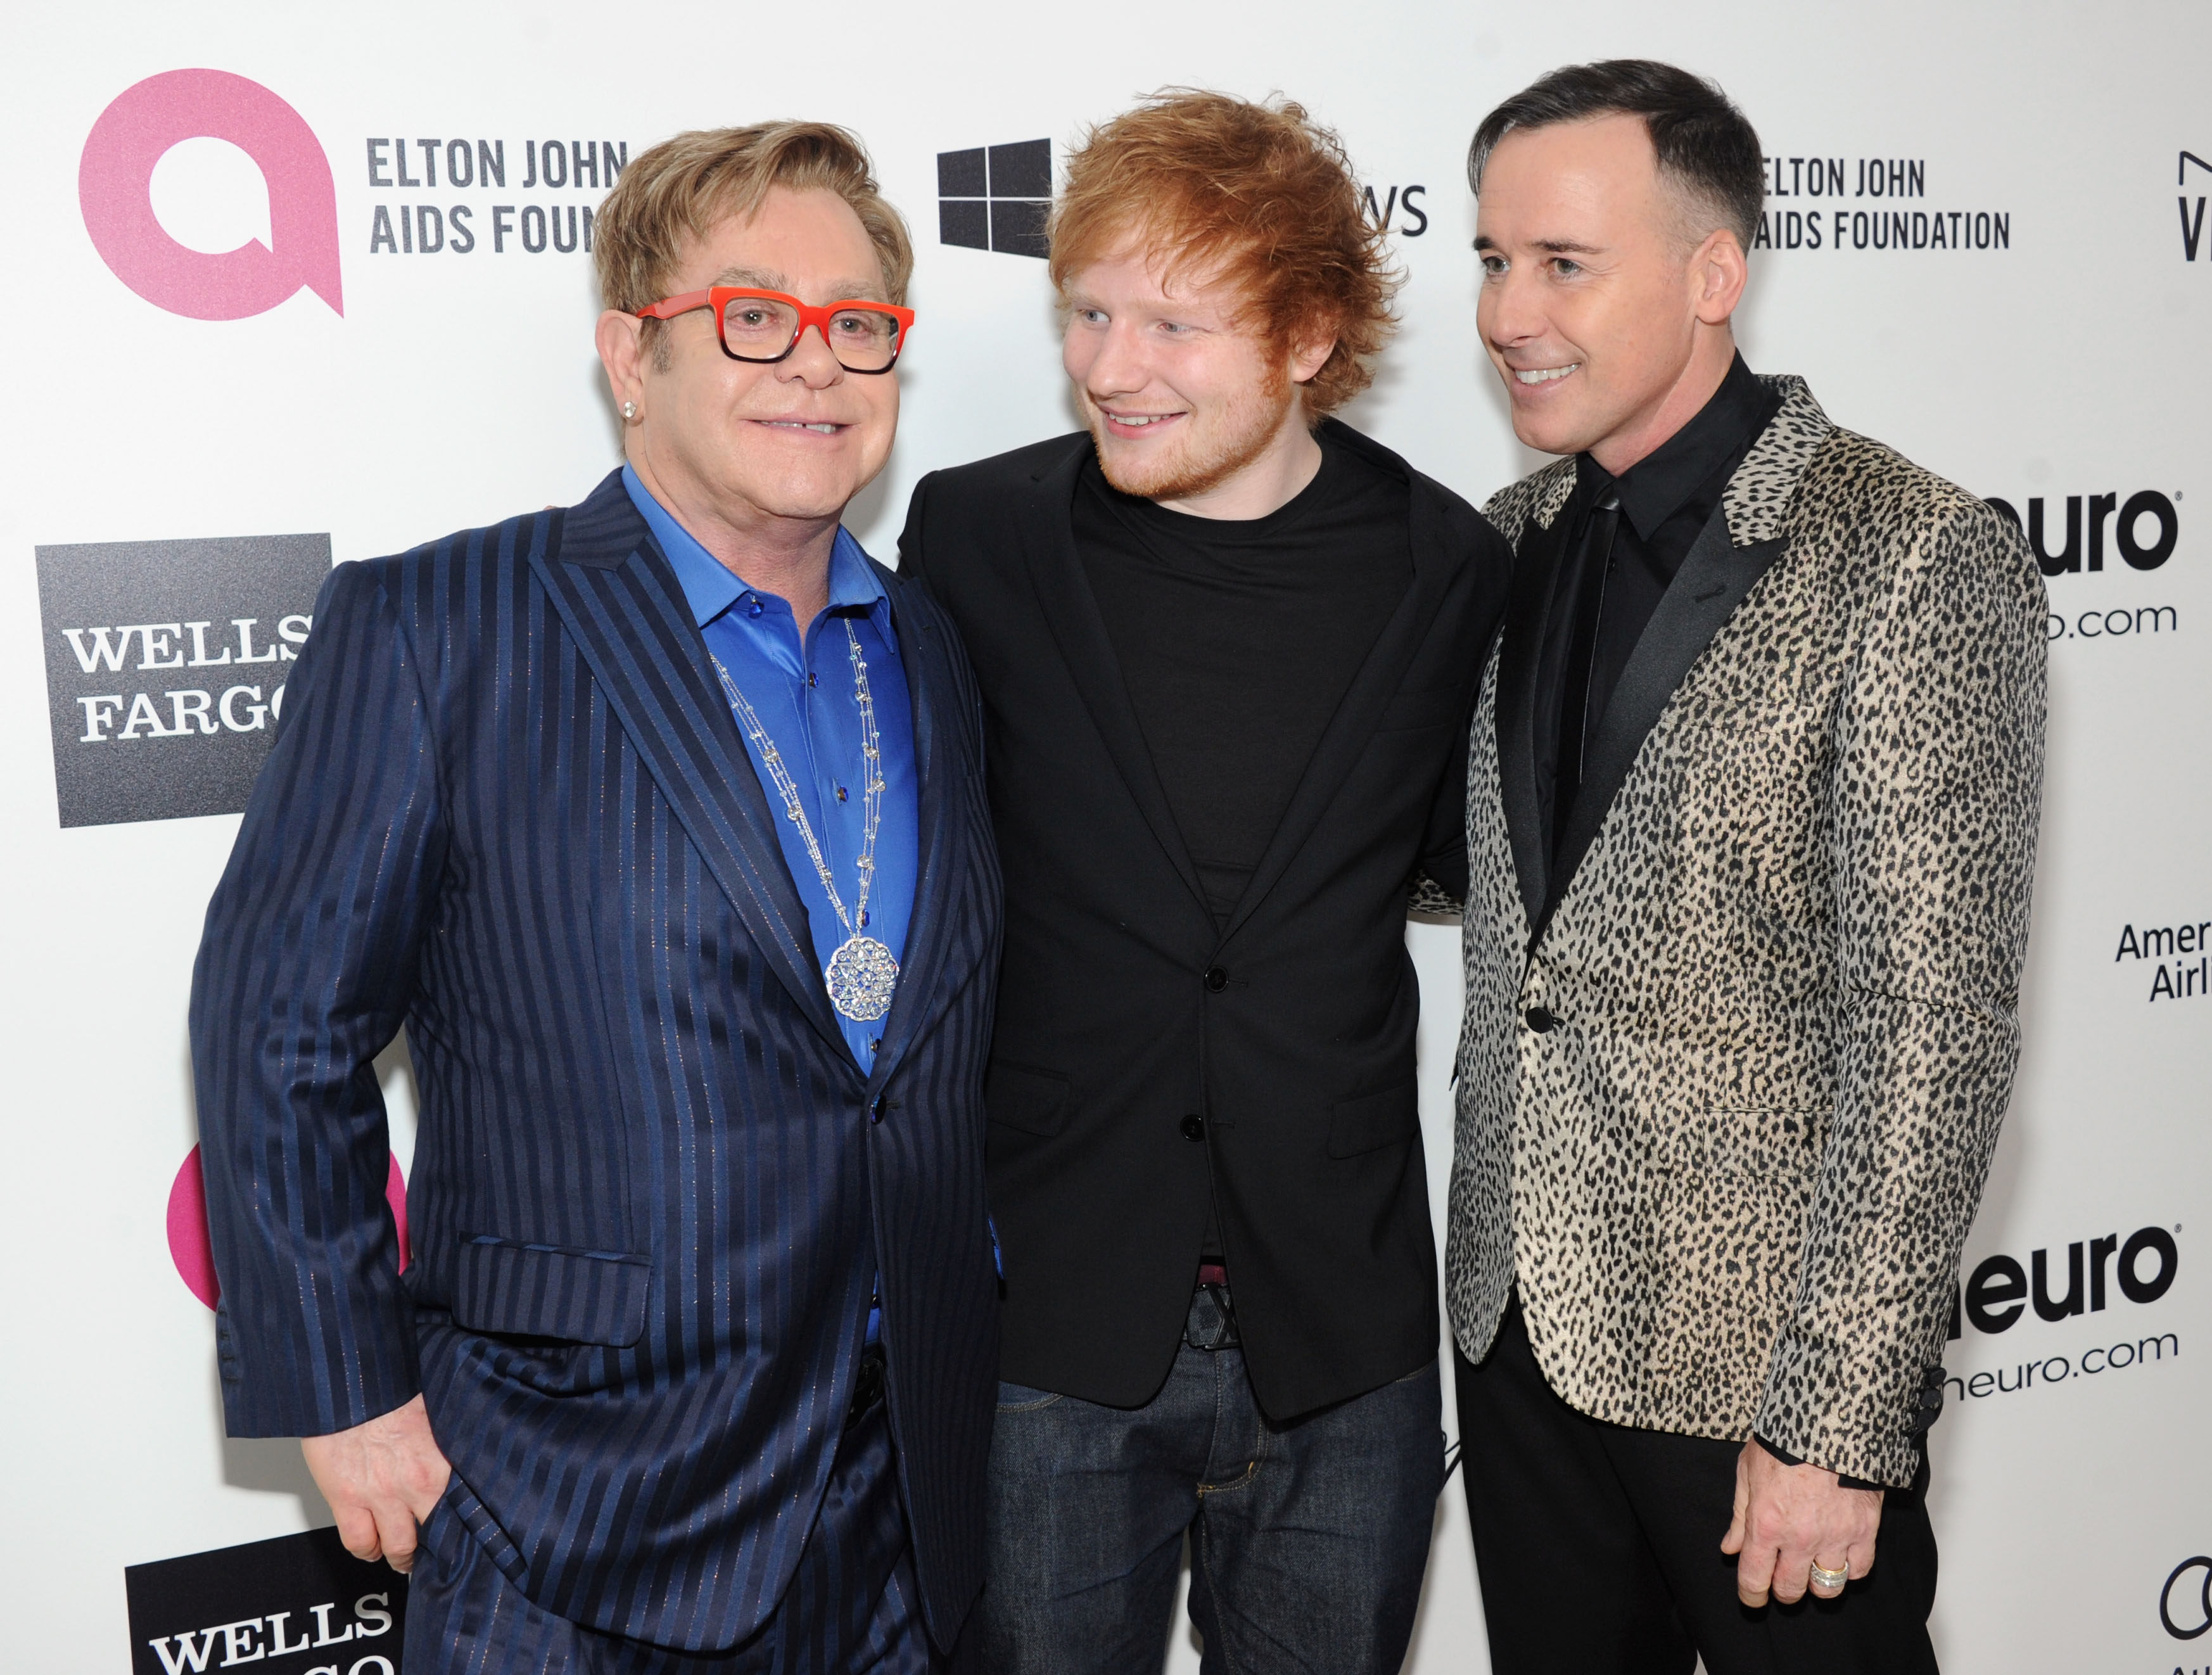 Elton John and Ed Sheeran Oscars Party 2014